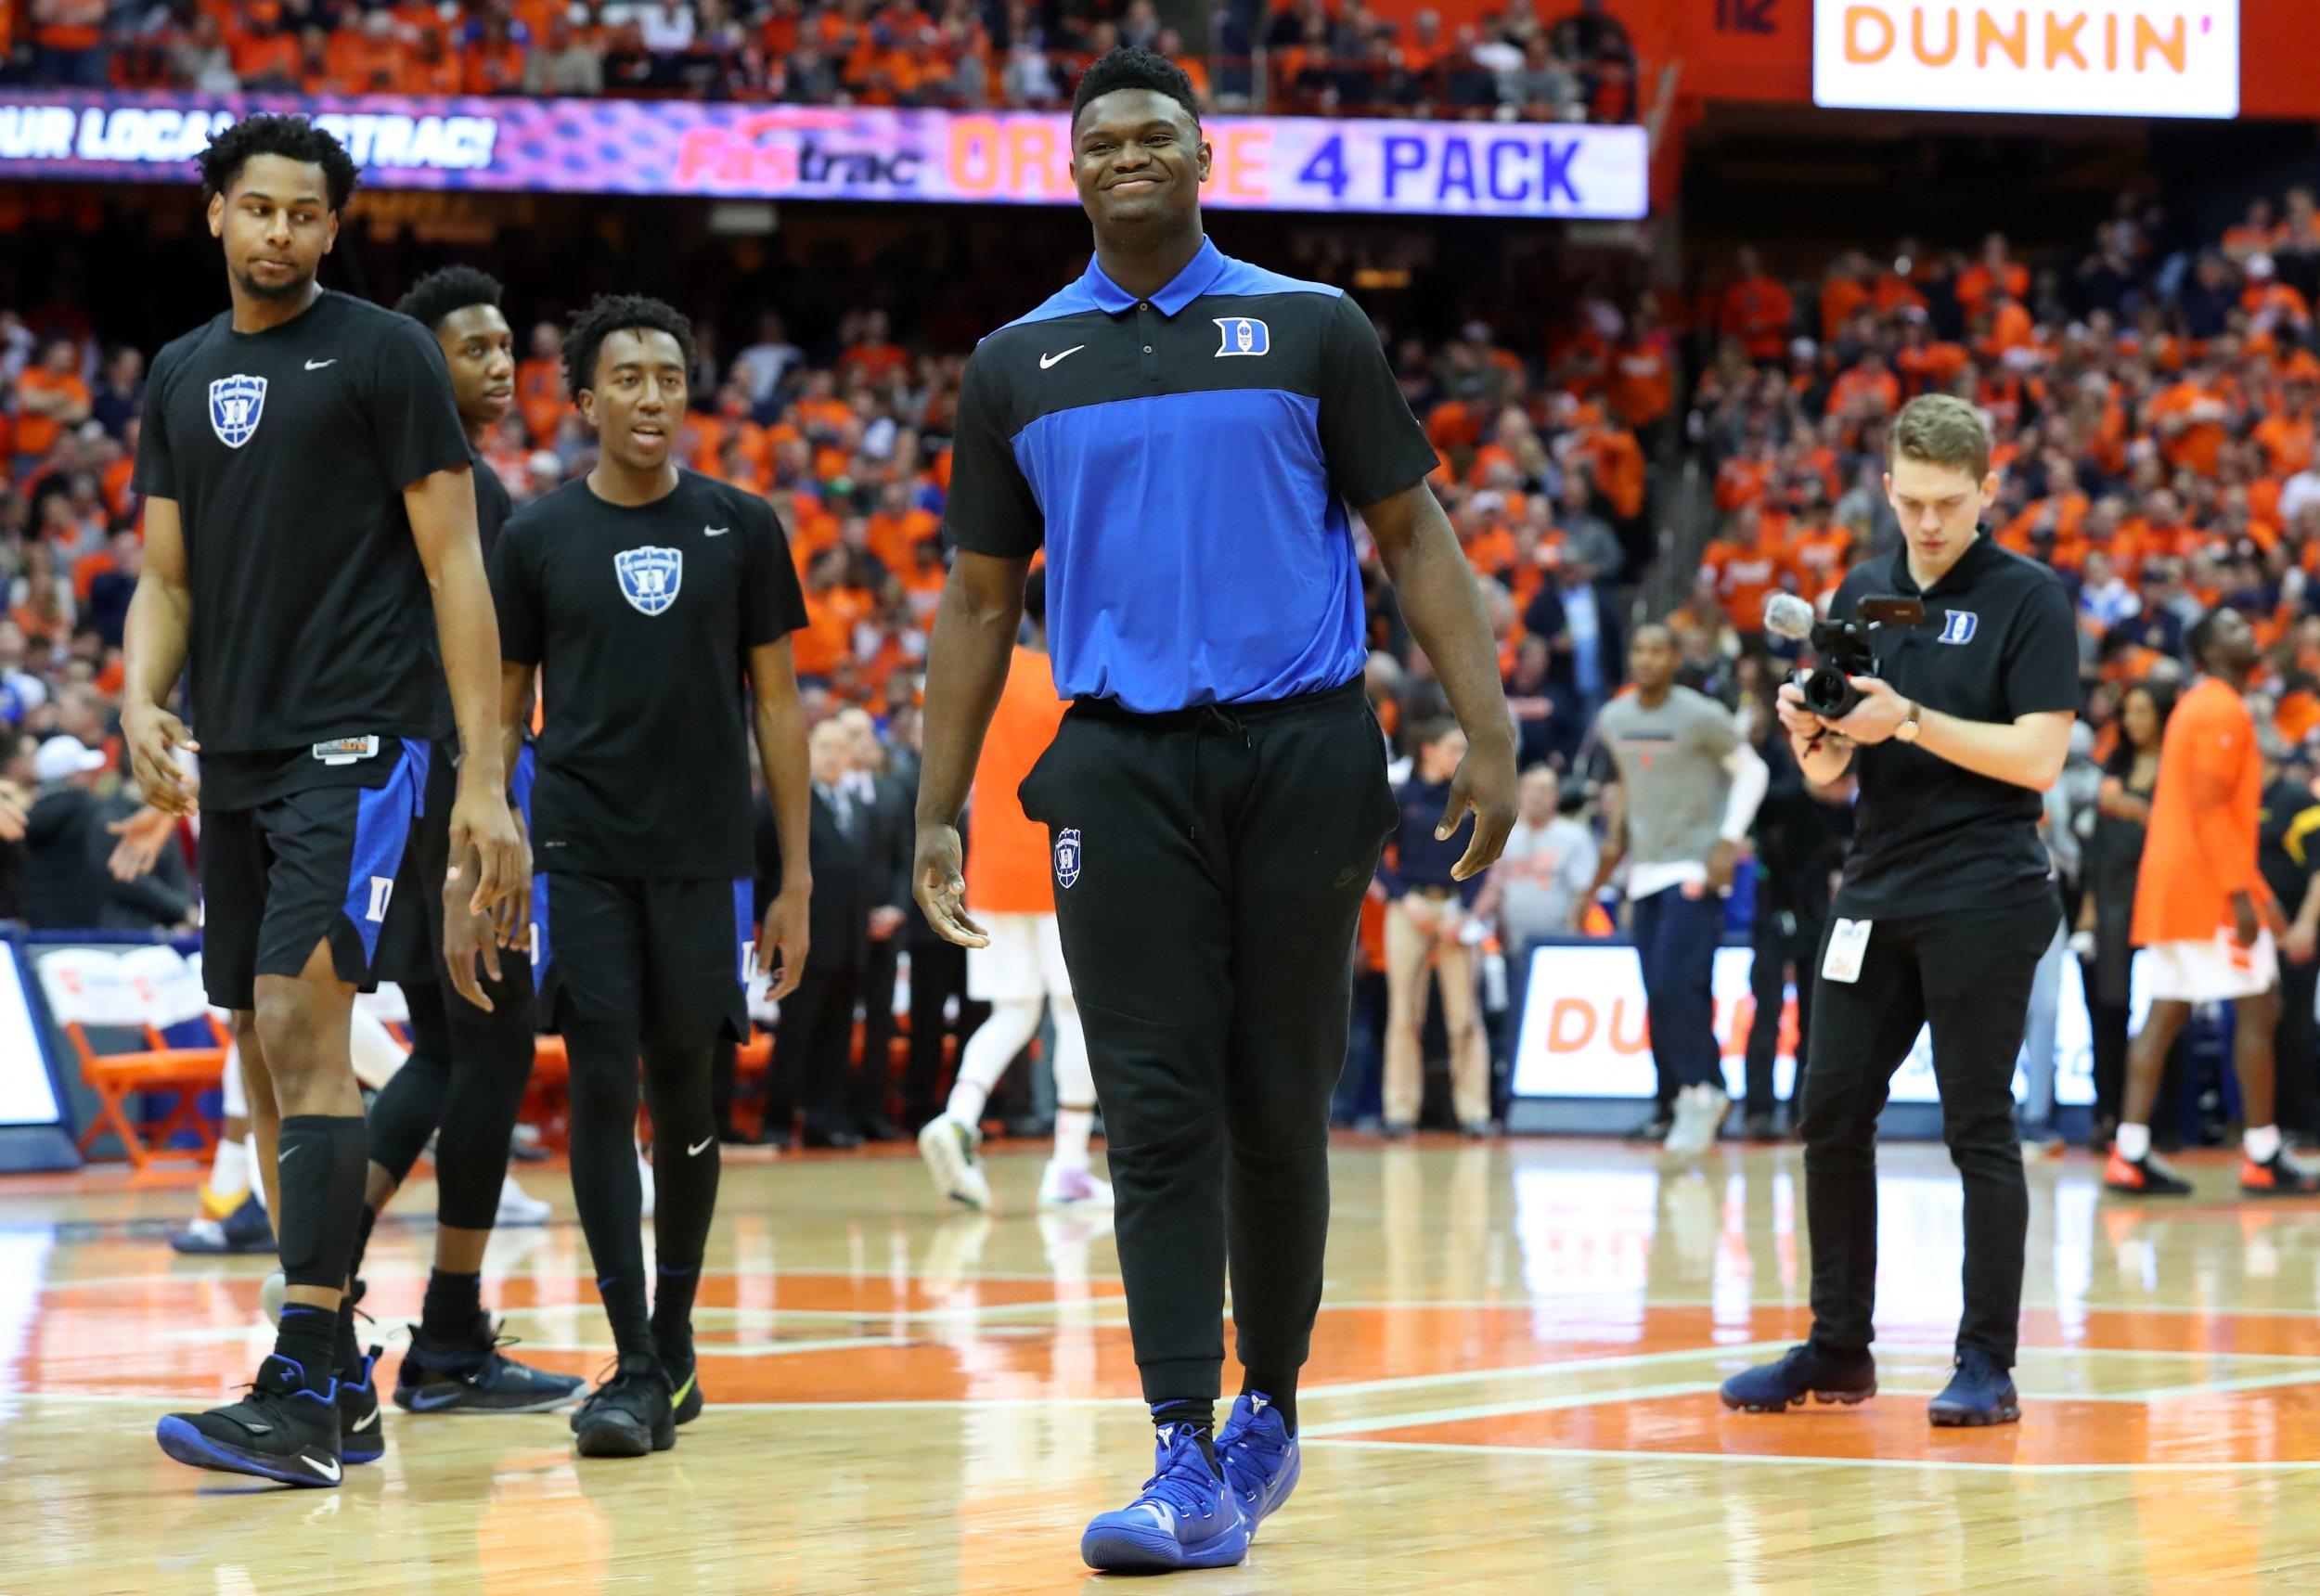 82011f12f22 Zion Williamson Injury Update  Duke Star s Status  Uncertain  Ahead of Game  Against Virginia Tech